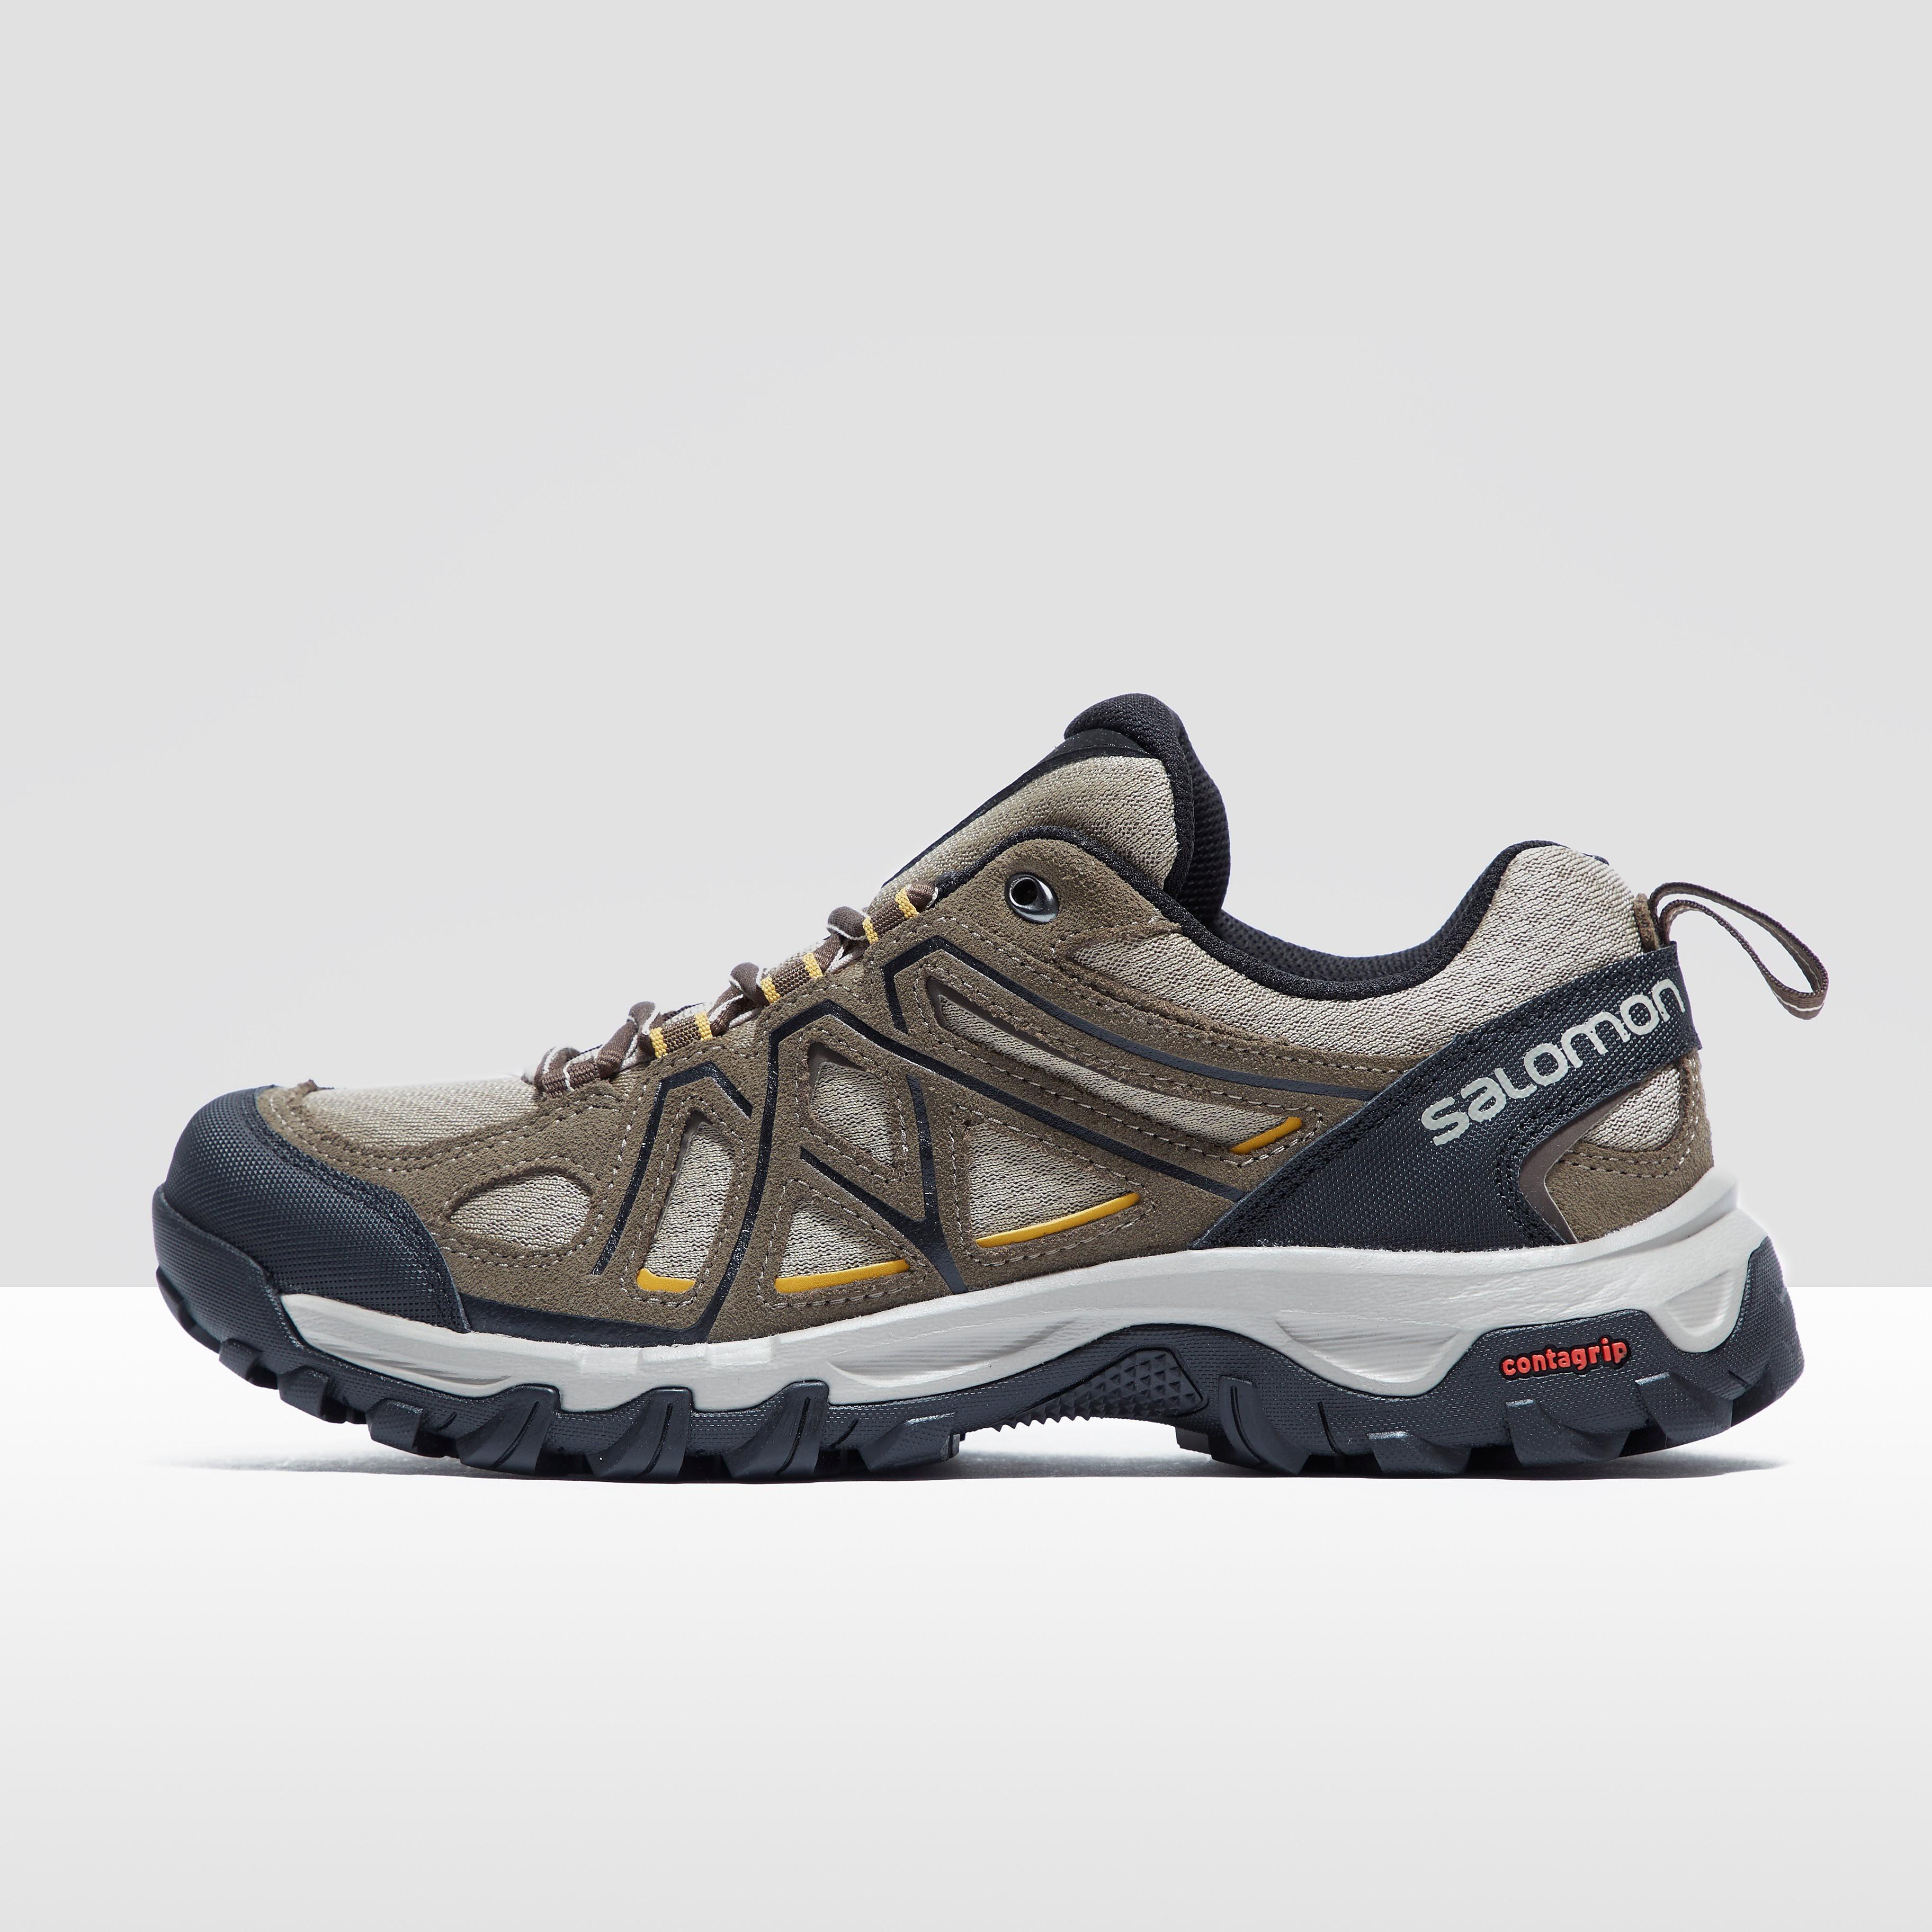 Salomon Evasion 2 Aero Men's Walking Shoes